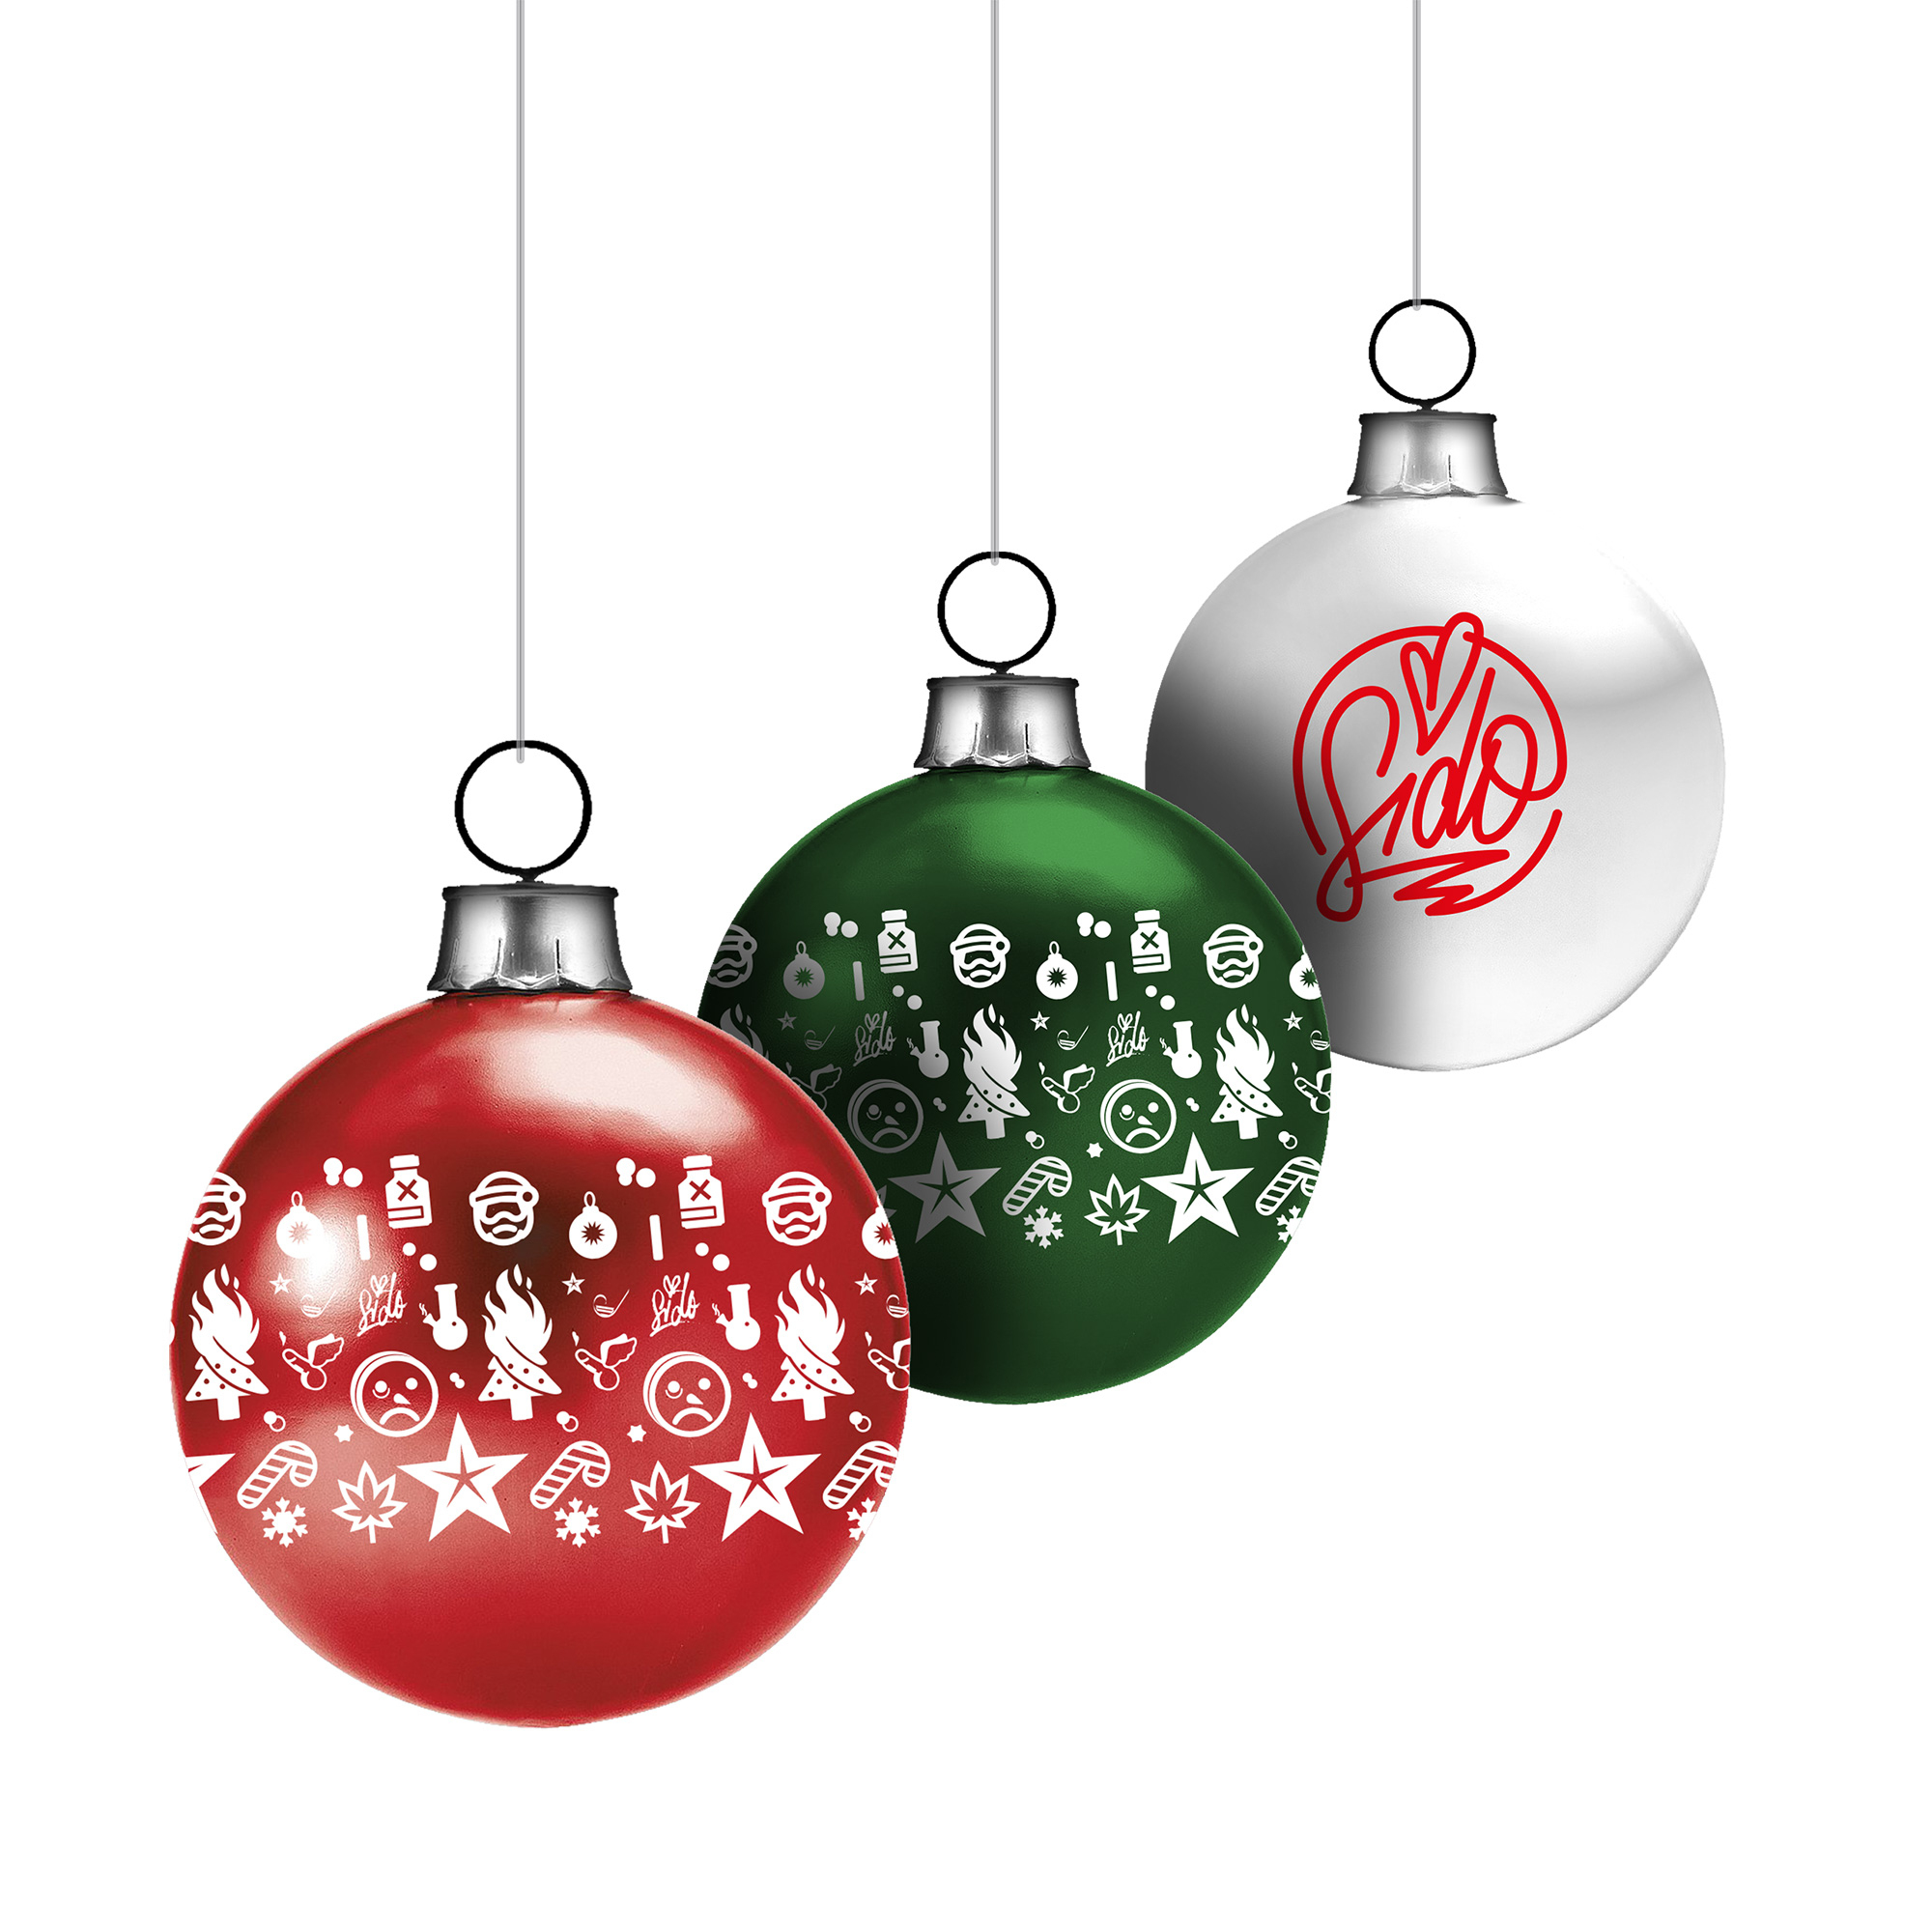 Bravado - Allover & Logo - Sido - Weihnachtskugeln 3-Er Set innen Weihnachtskugeln Comic